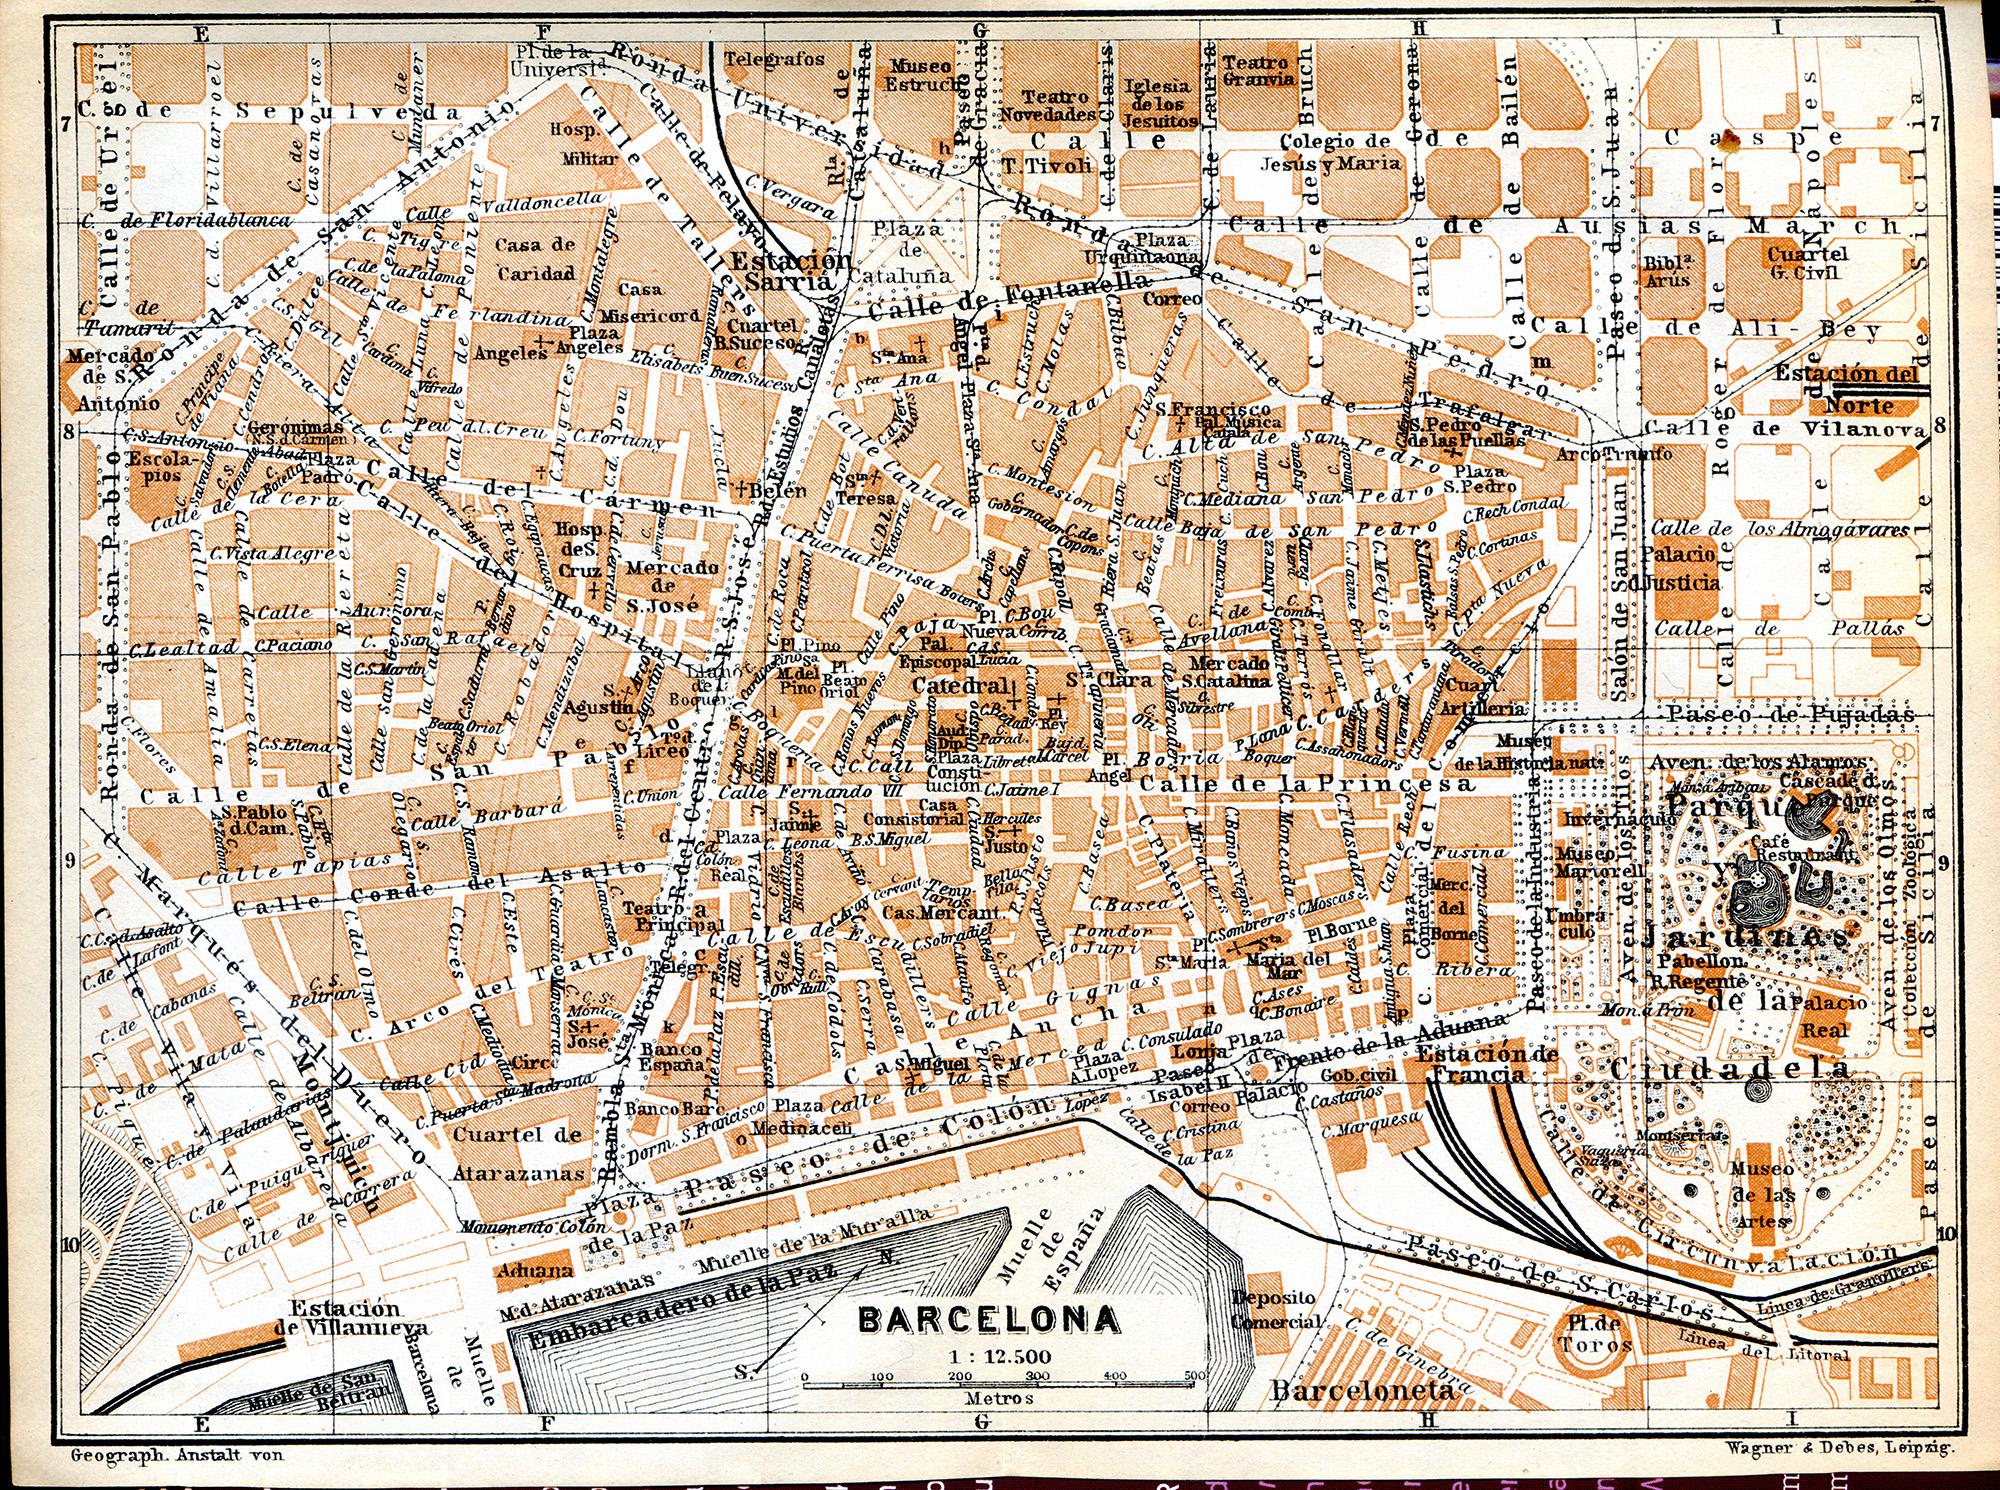 Barcelona City Map – Barcelona City Map Tourist